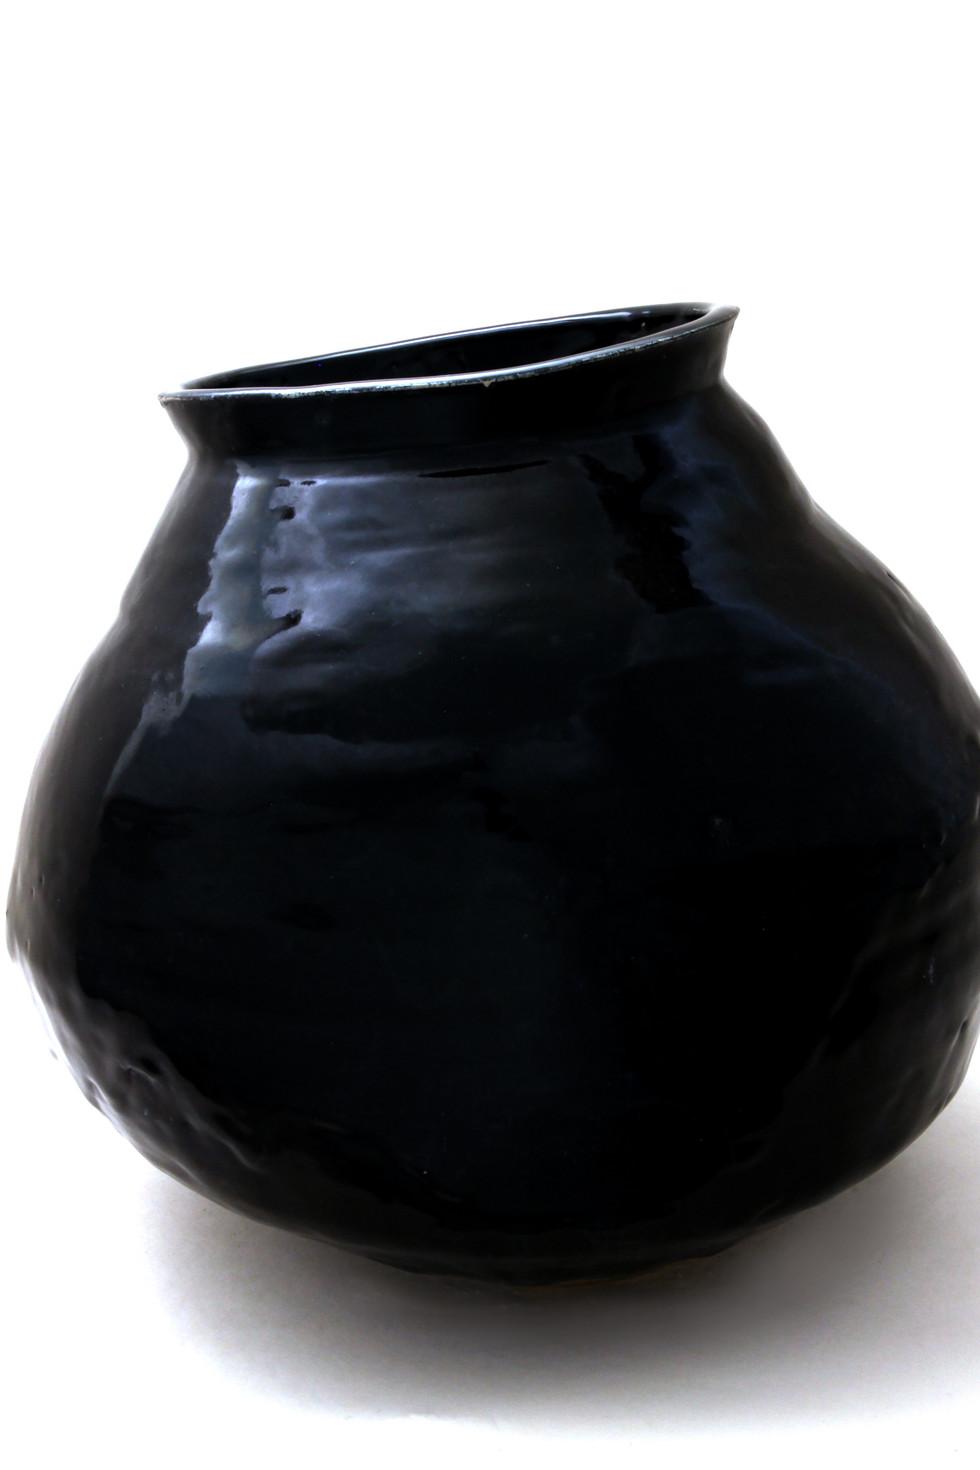 Kim Syyoung's Black ceramic Jar